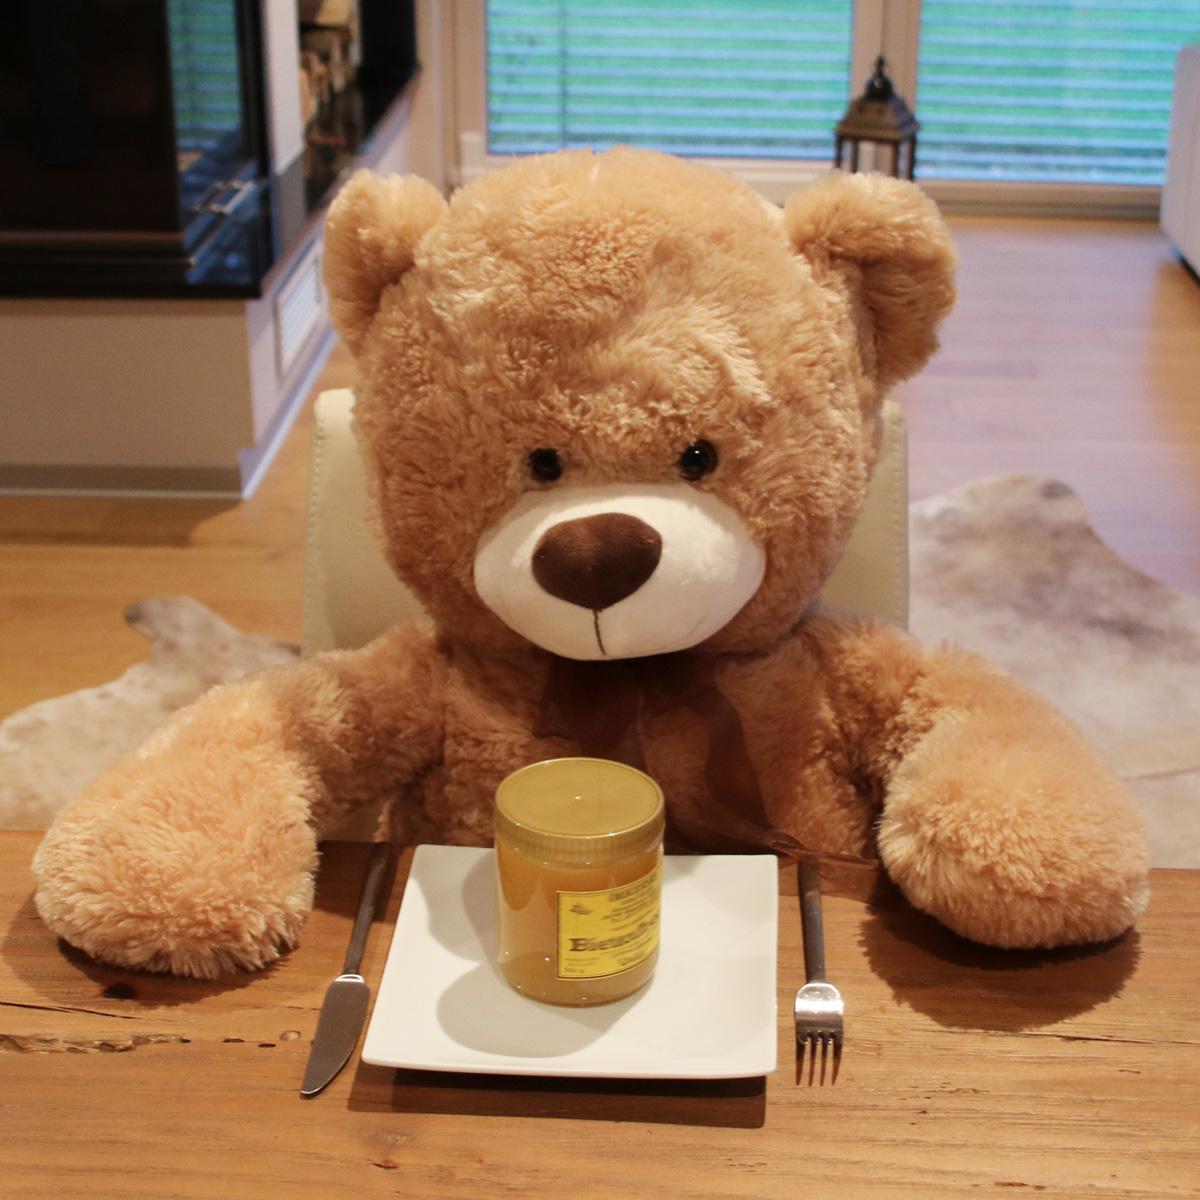 xxl teddyb r b r 1m gro kuscheltier teddy kuschelweich. Black Bedroom Furniture Sets. Home Design Ideas